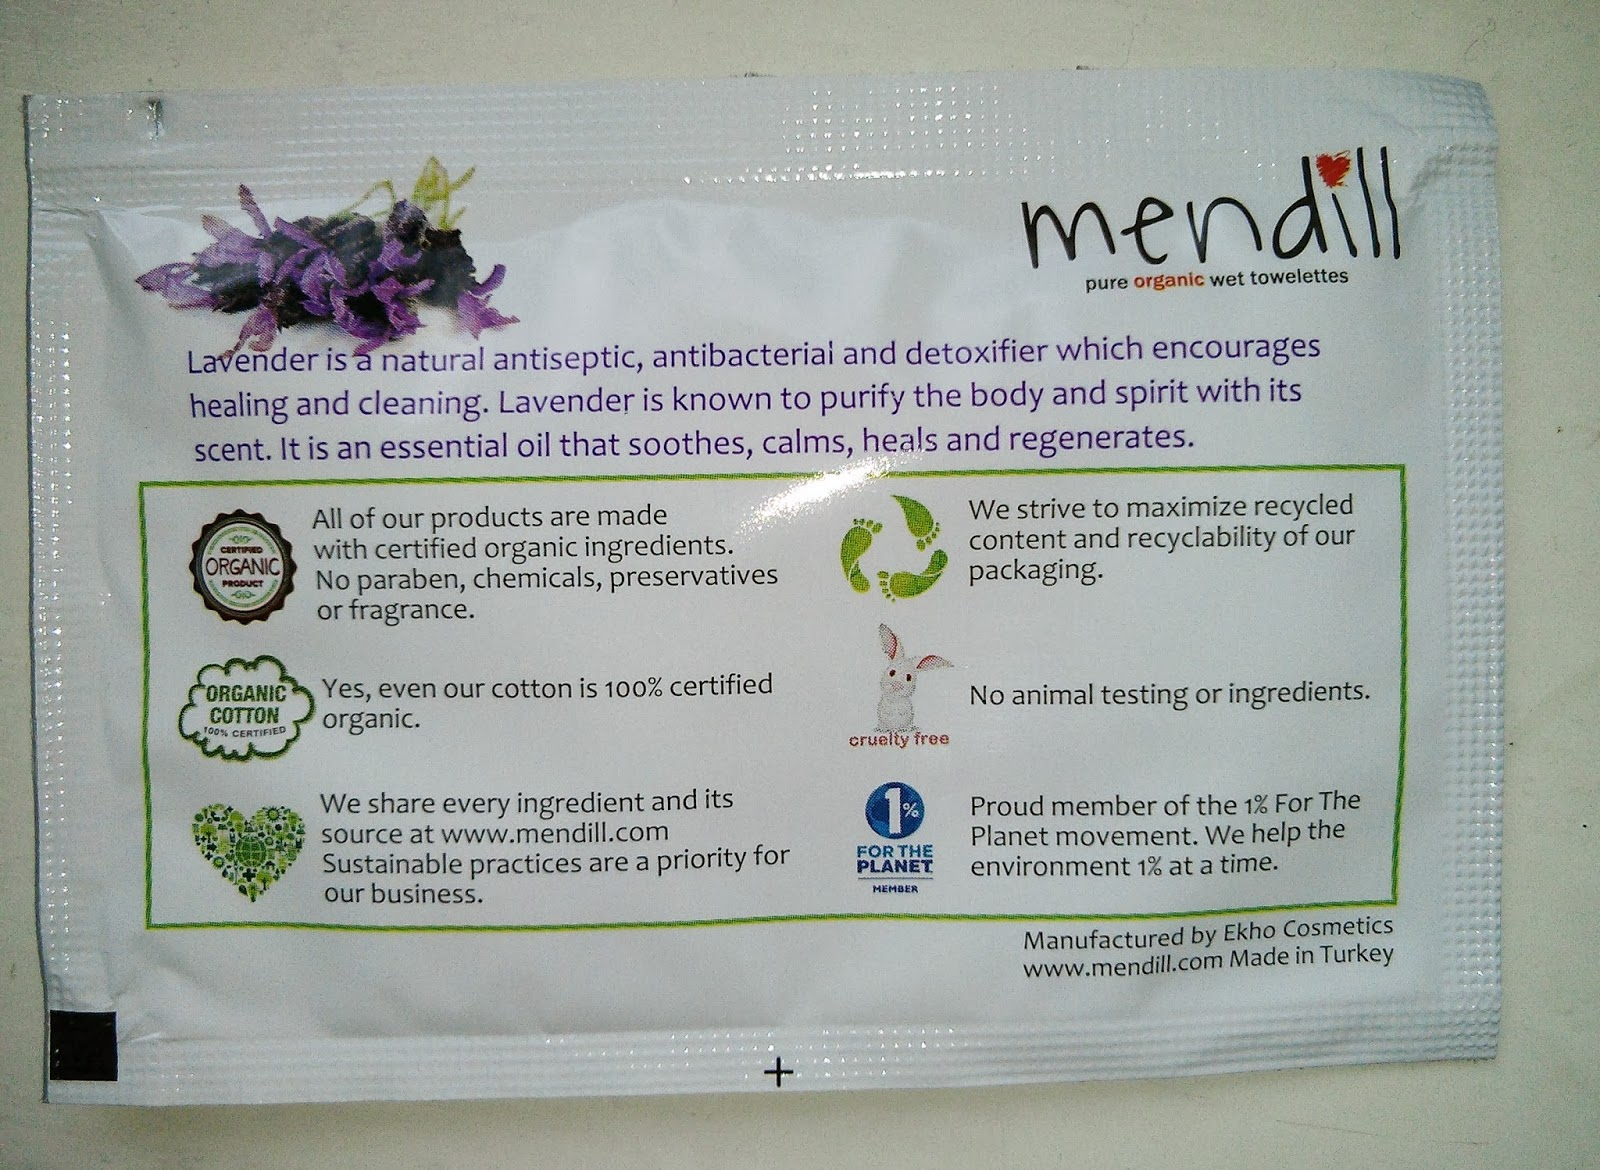 Mendill pure organic wet towelettes